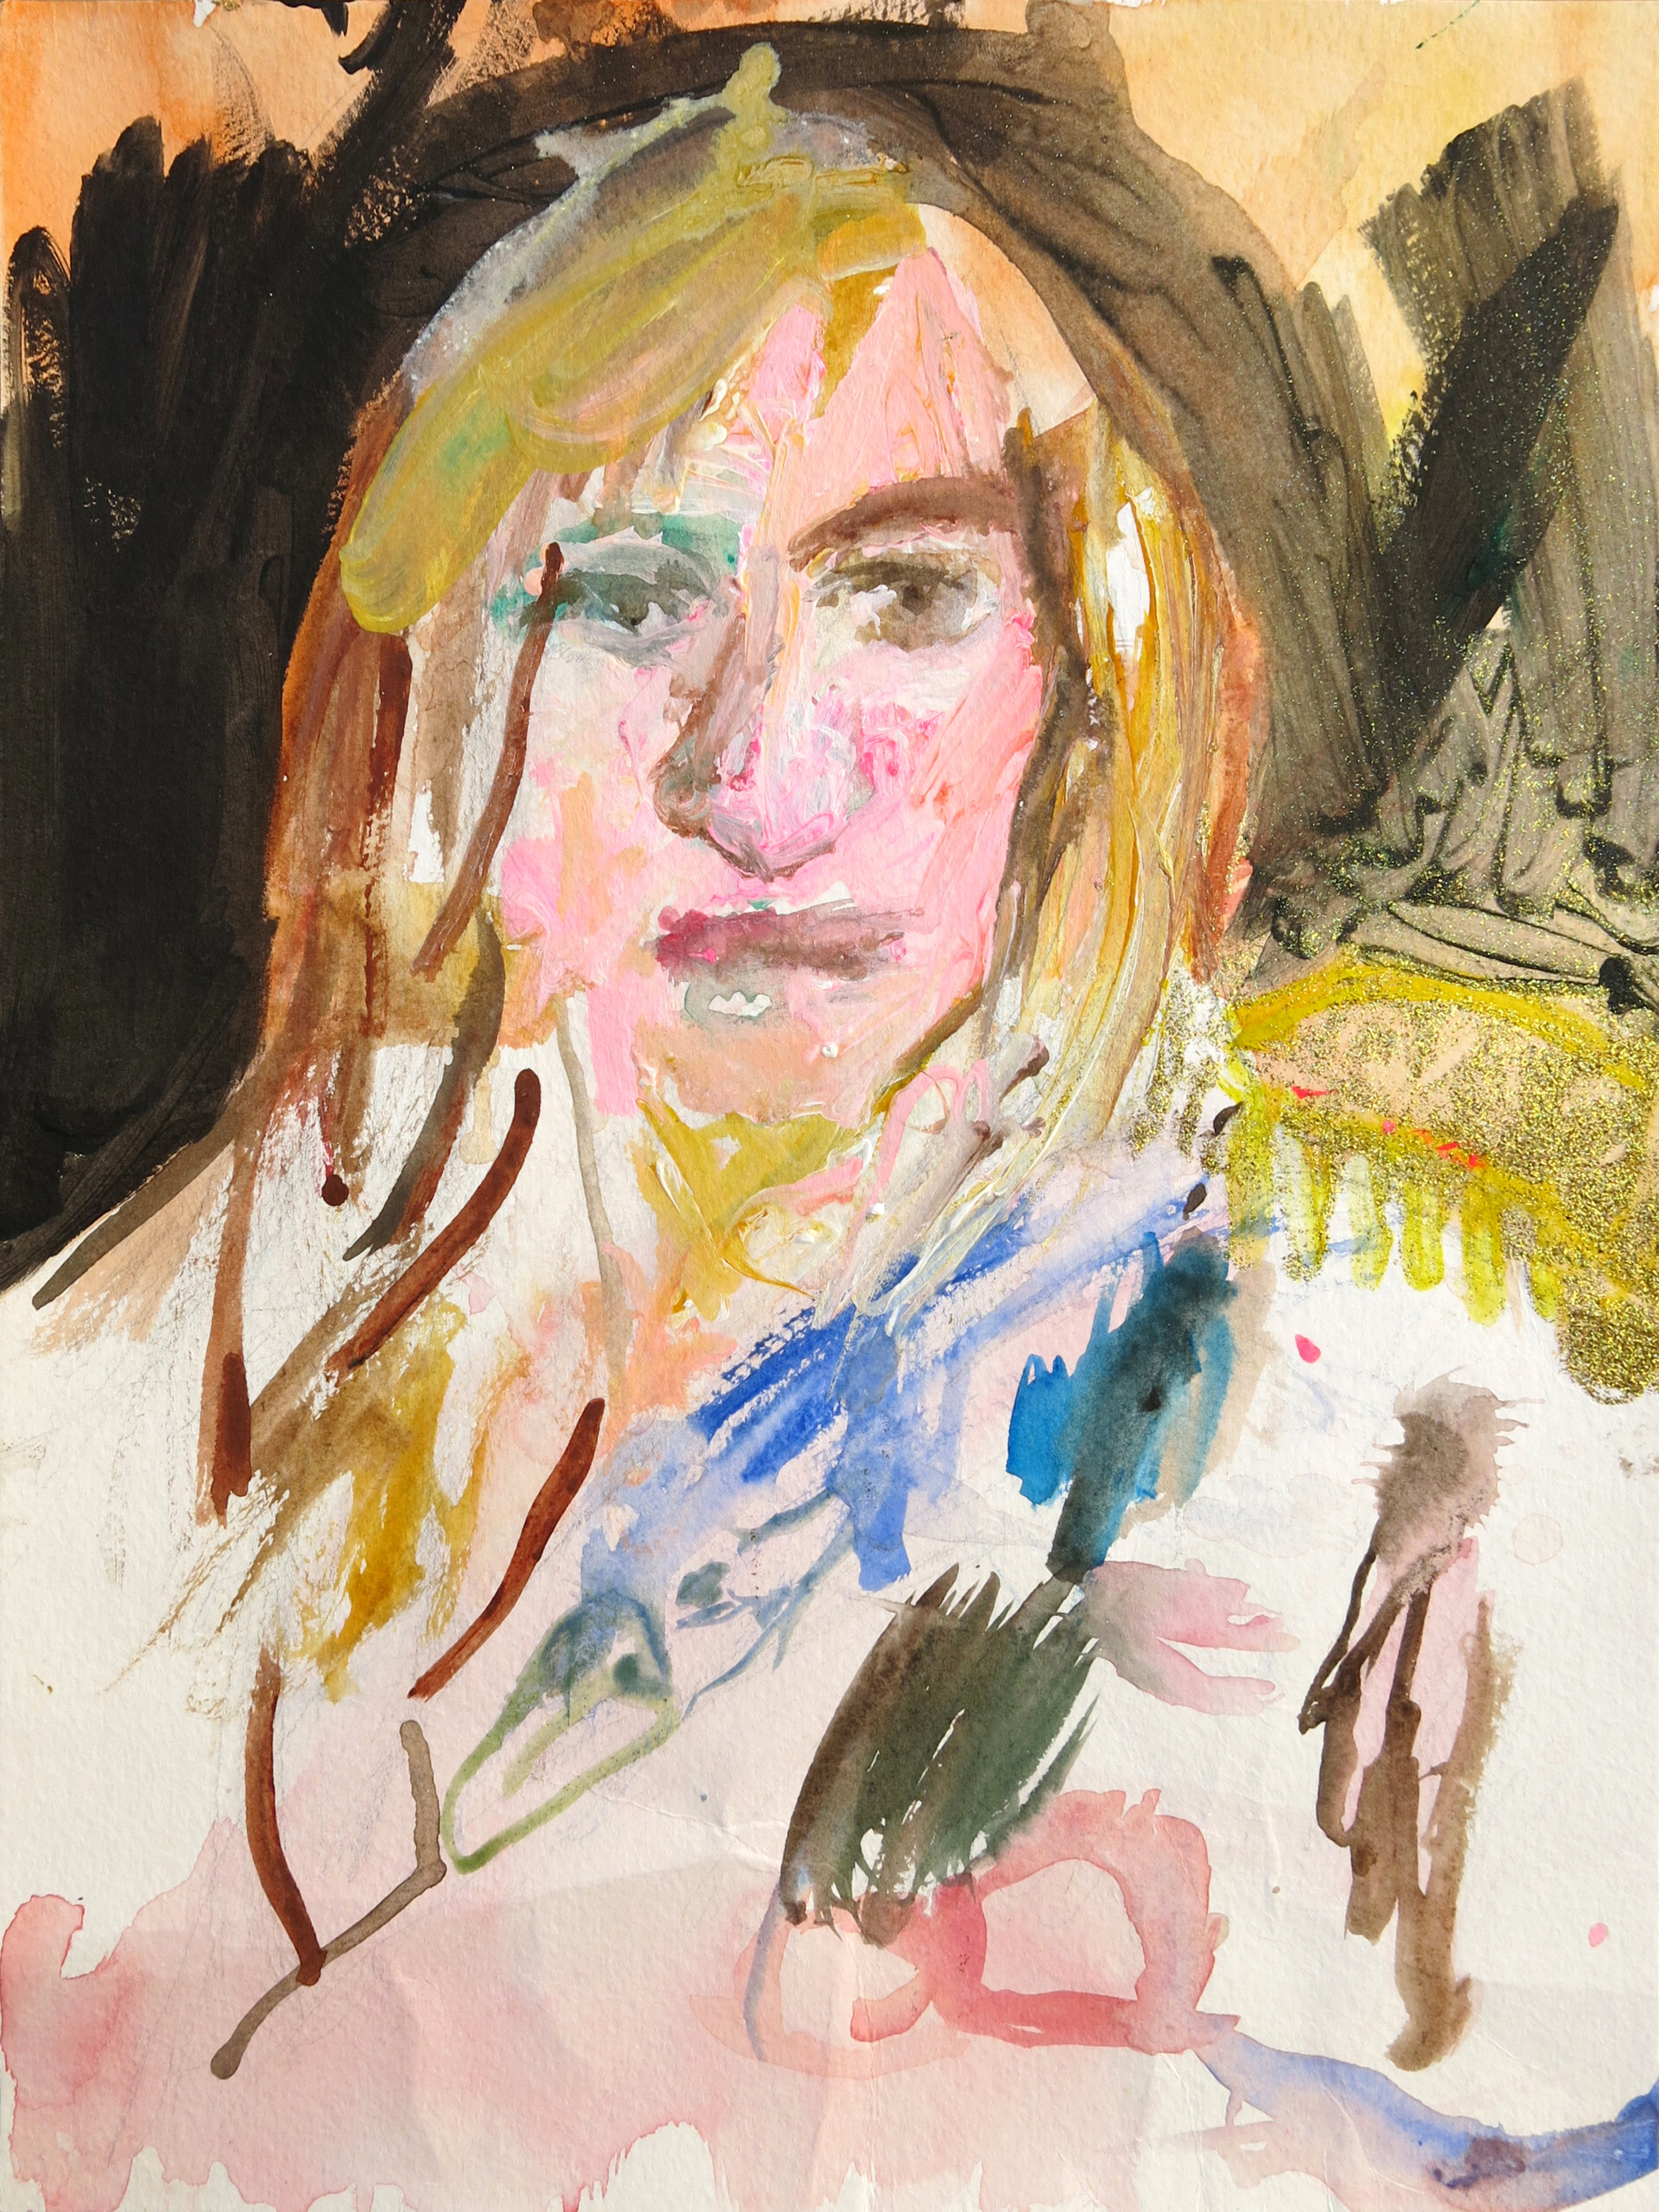 Barbra Streisand Portrait #28